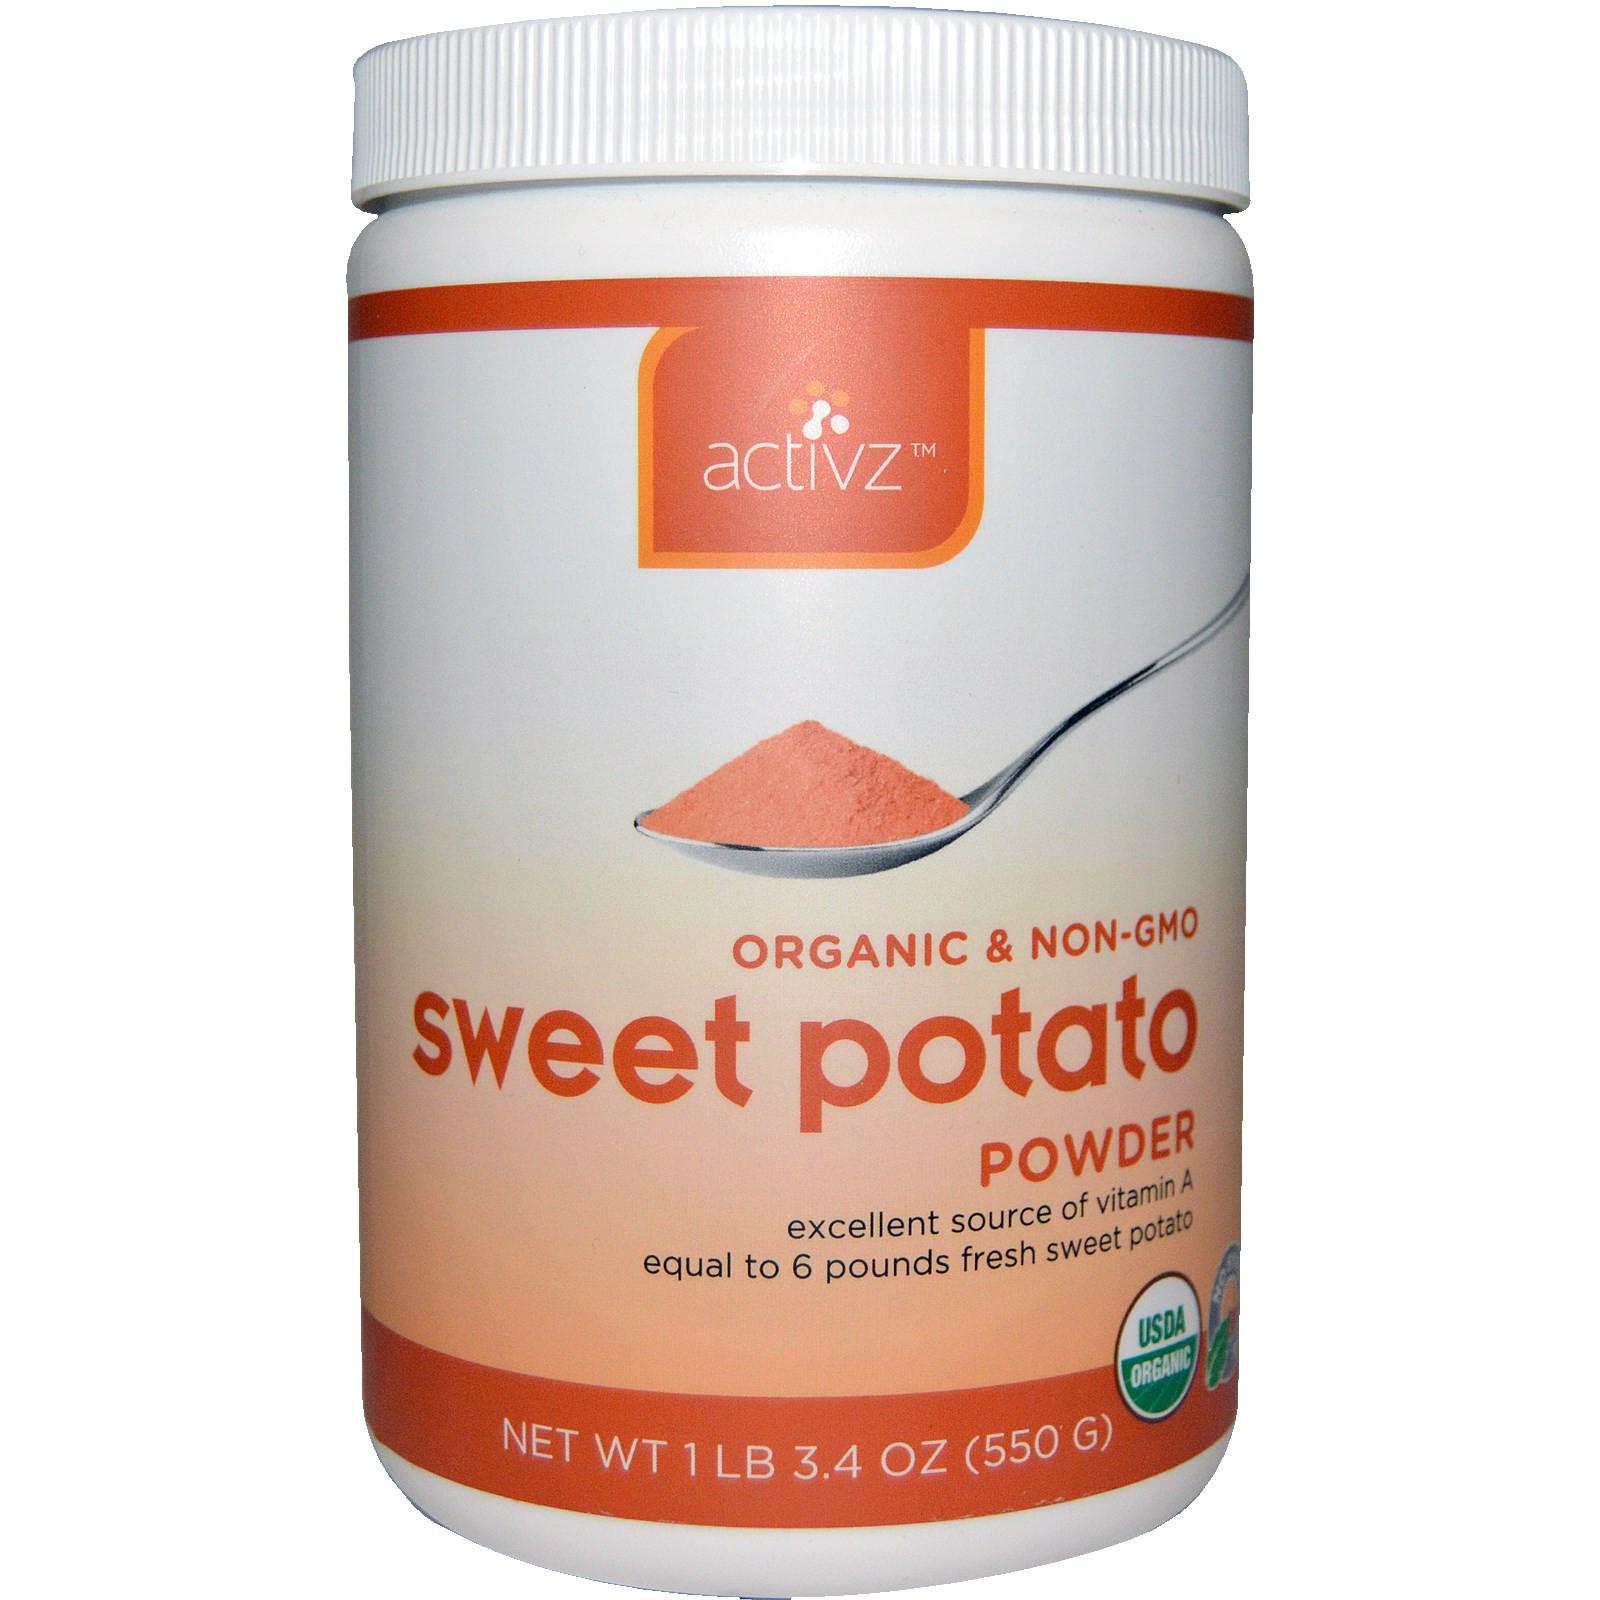 Sweet Potato Powder  Activz Sweet Potato Powder 3 4 oz 550 g iHerb